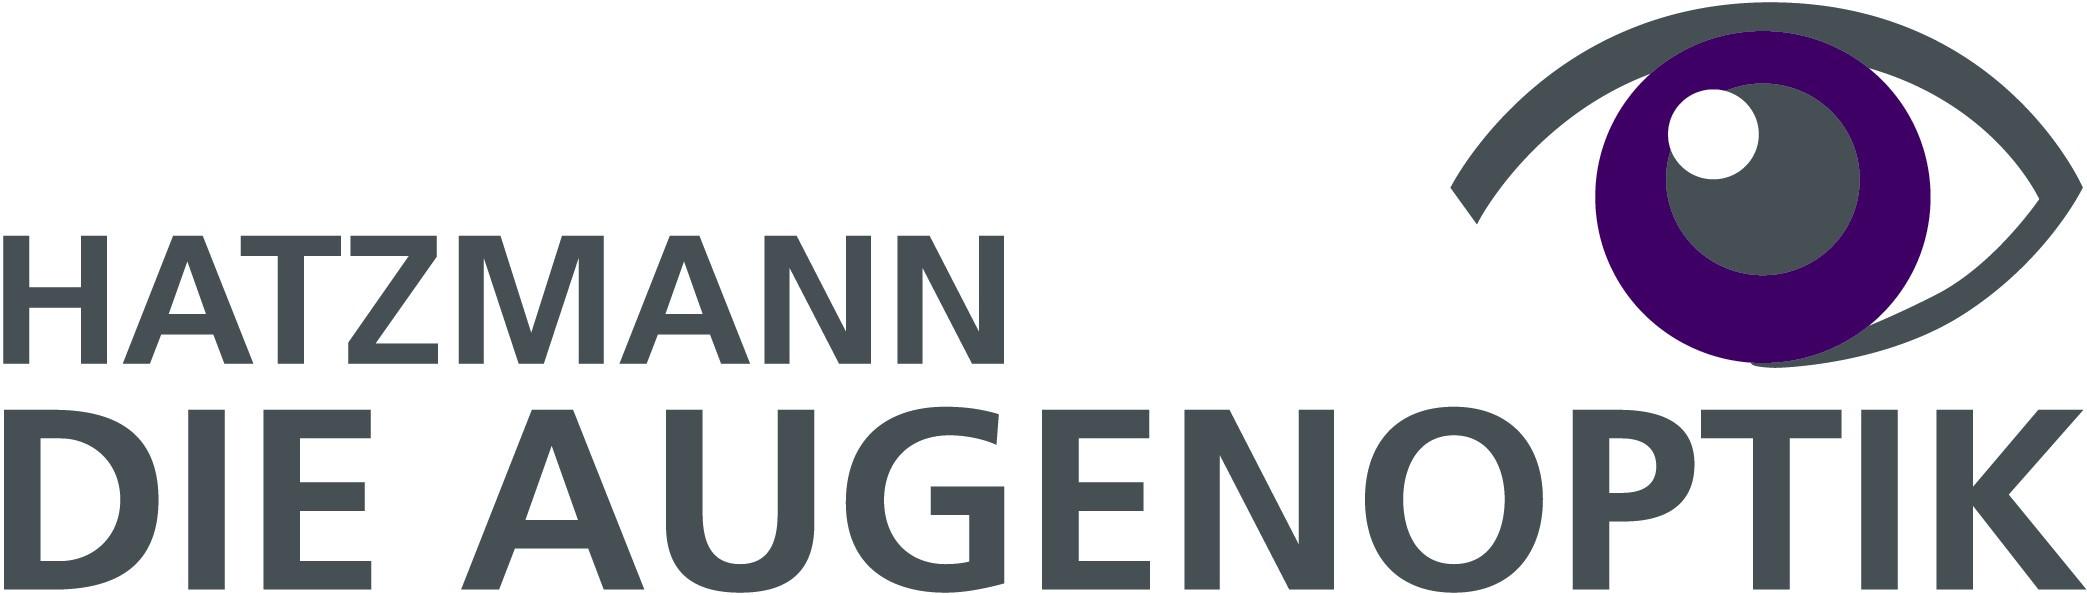 hatzmann-logo